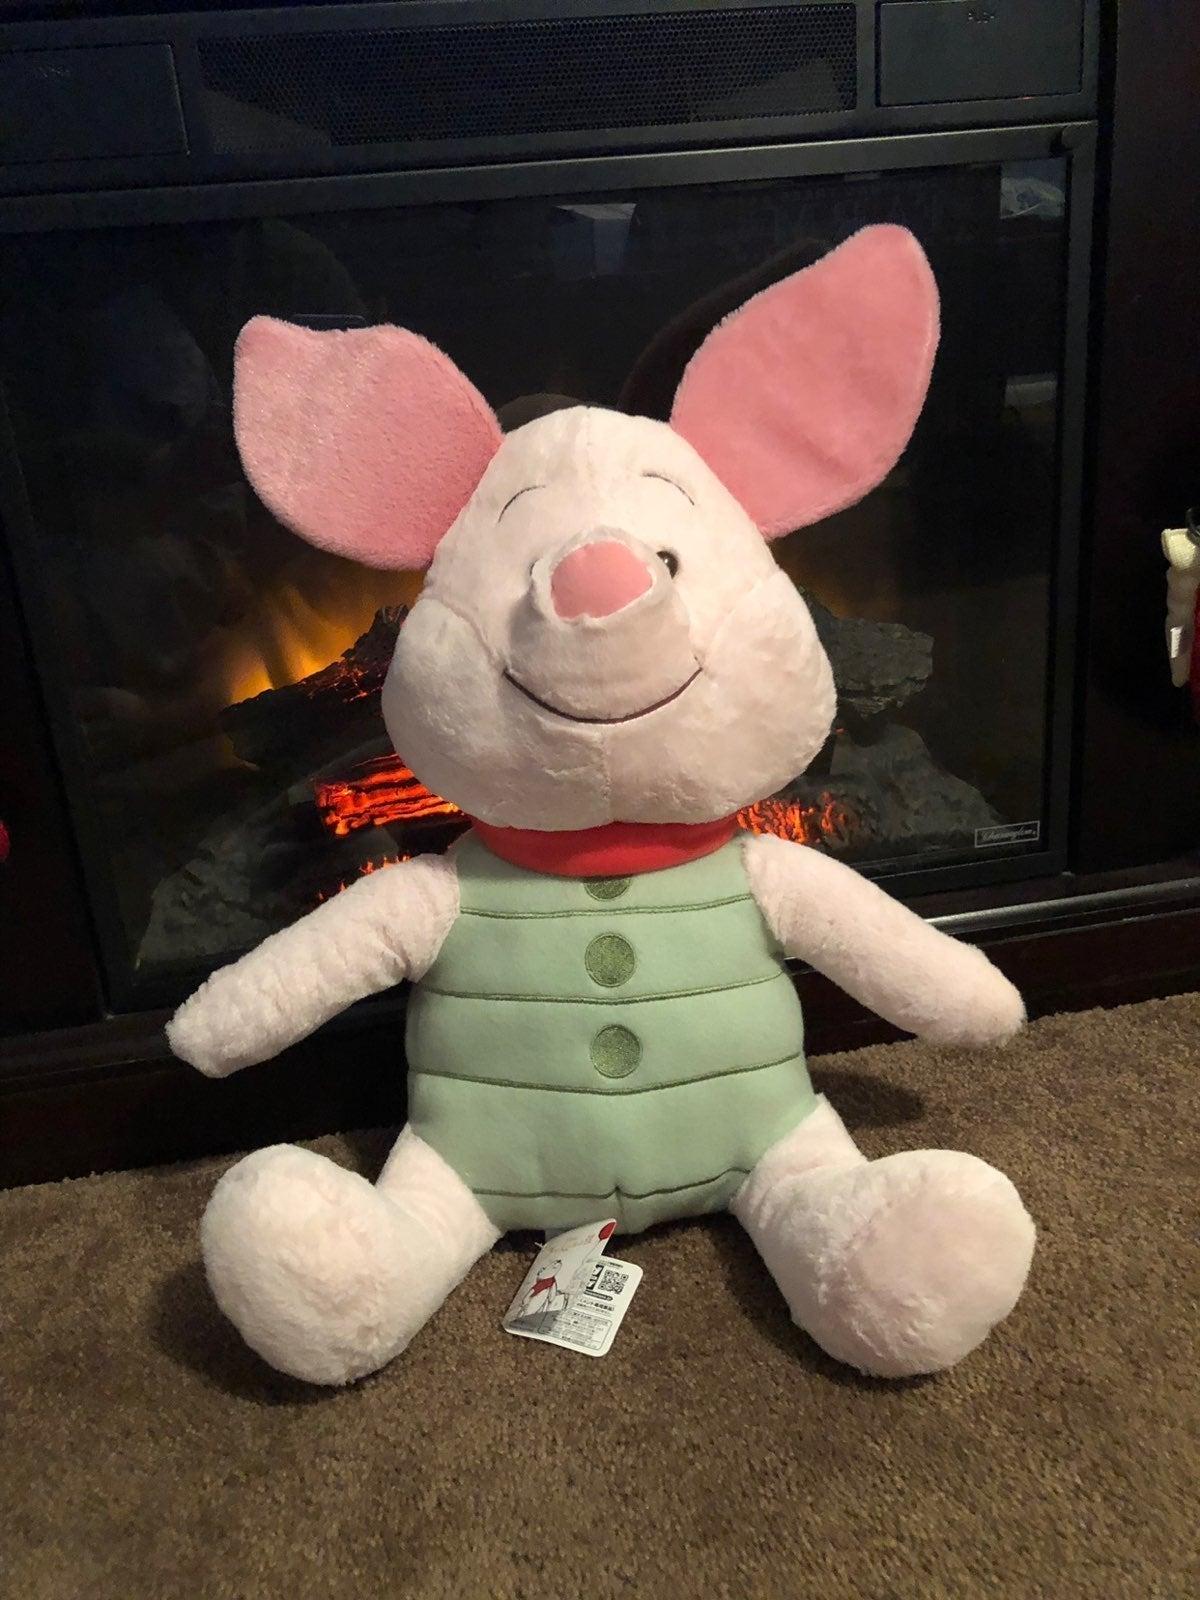 Piglet Plush!